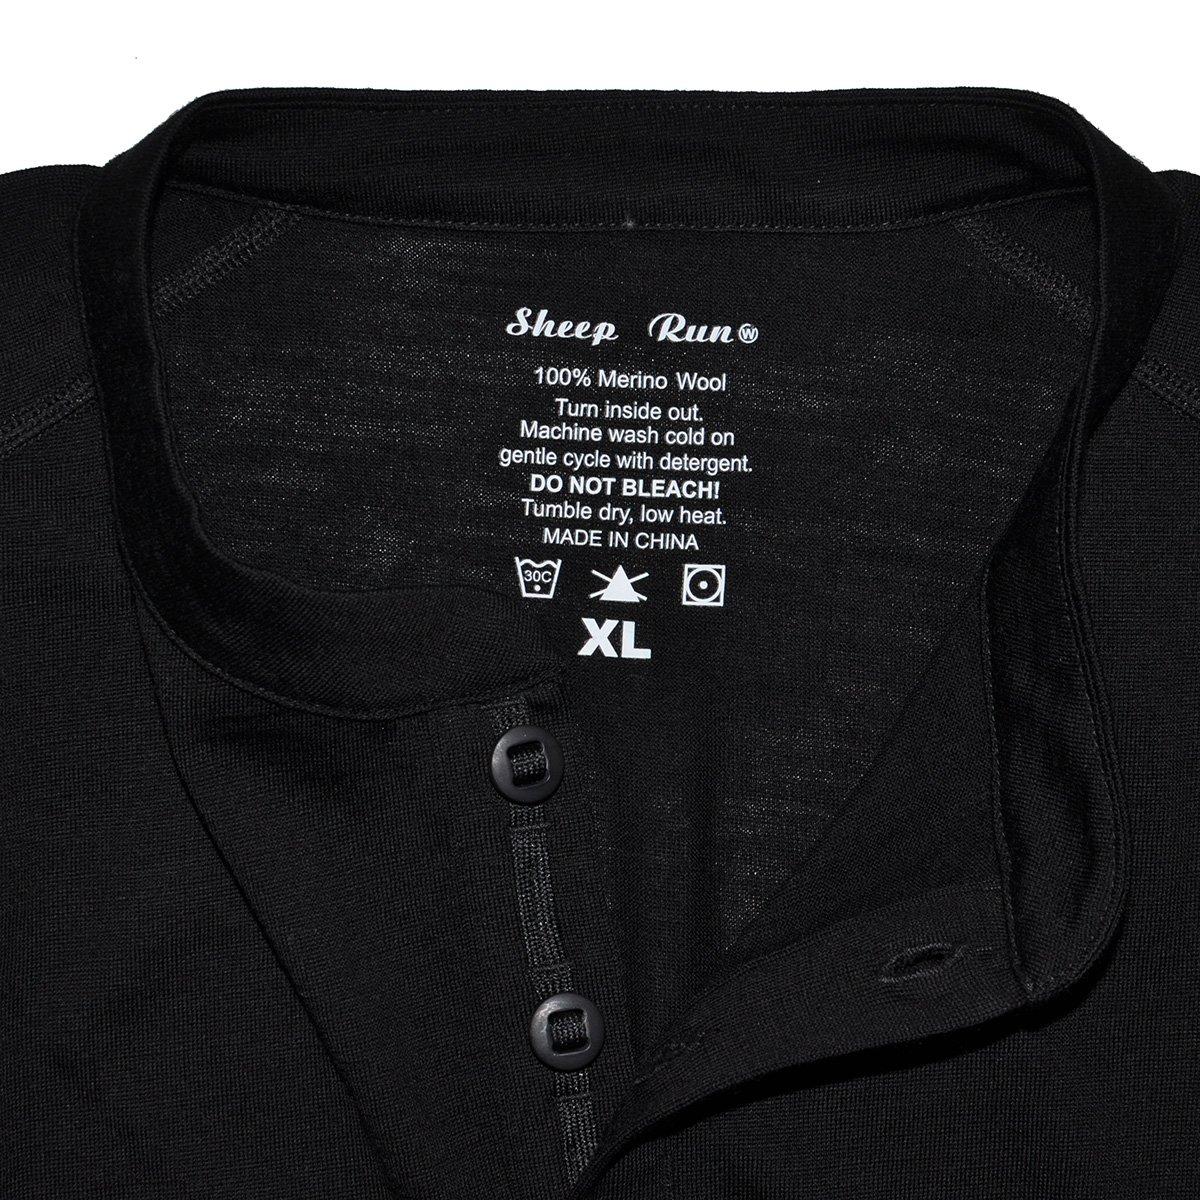 790d4cf9a081 Men's 100% Merino Wool Lightweight Long Sleeve Base Layer Tops at Amazon  Men's Clothing store: